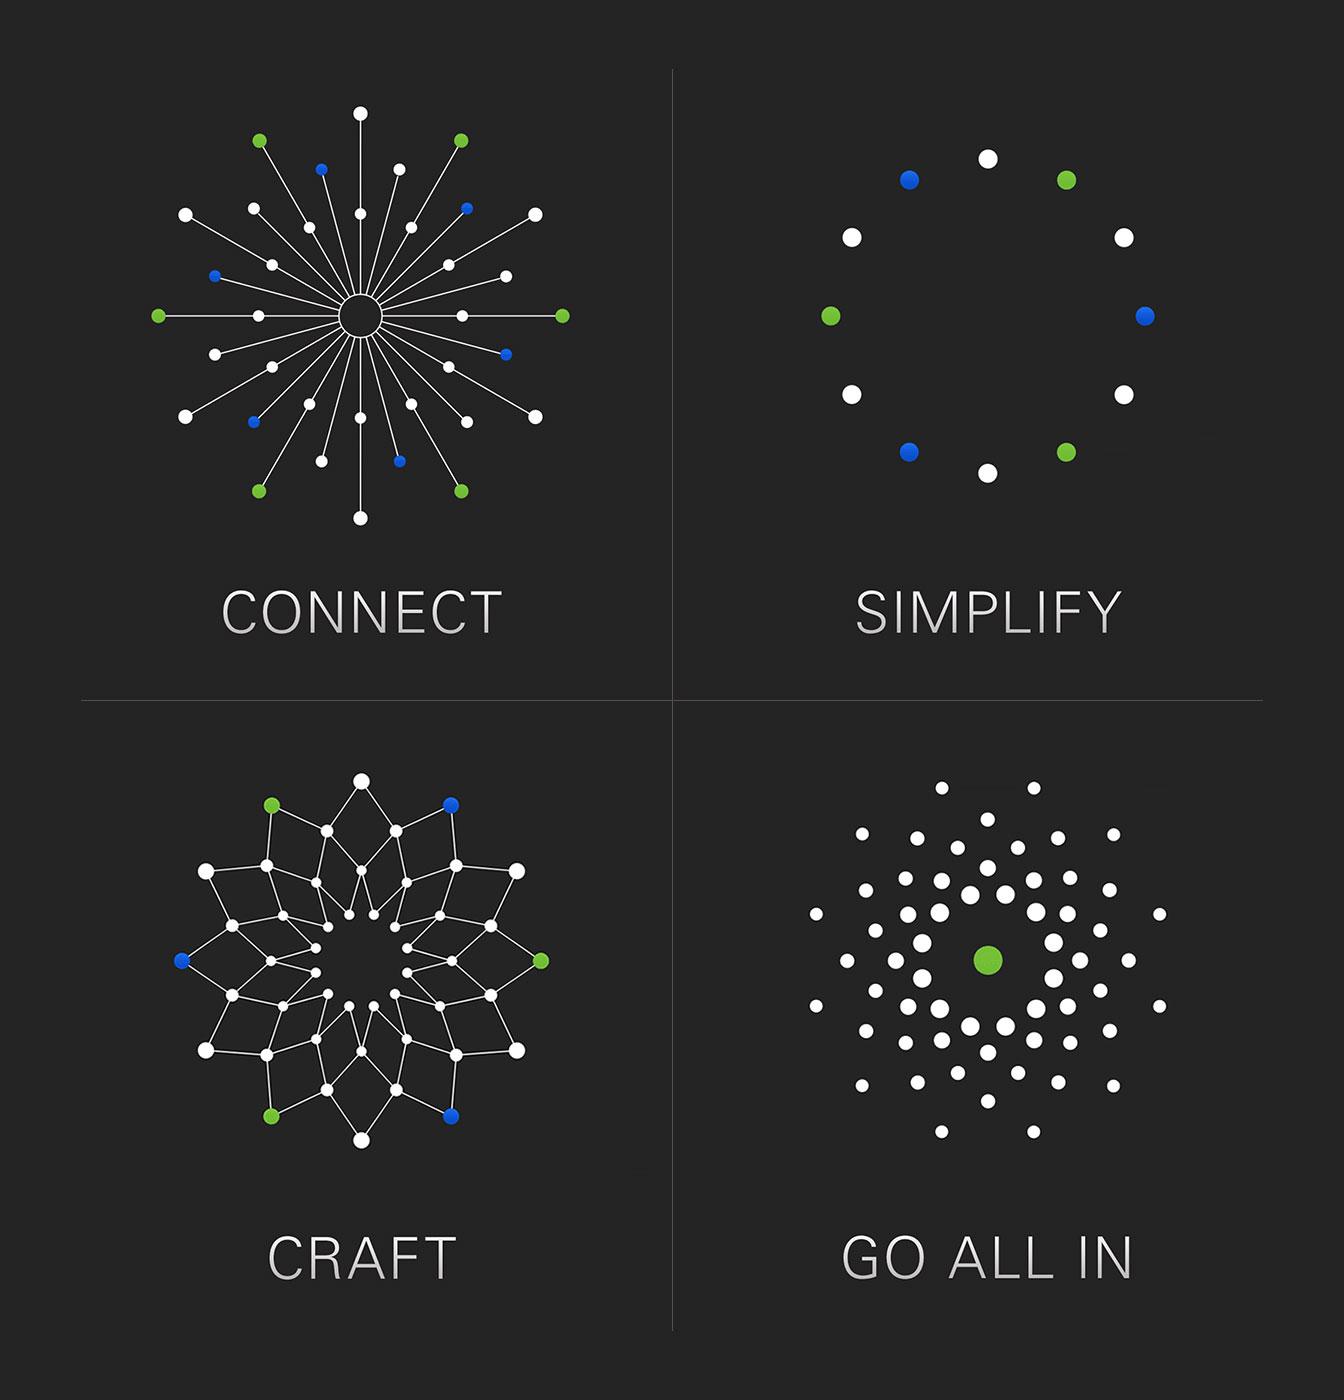 Design Principles Grid